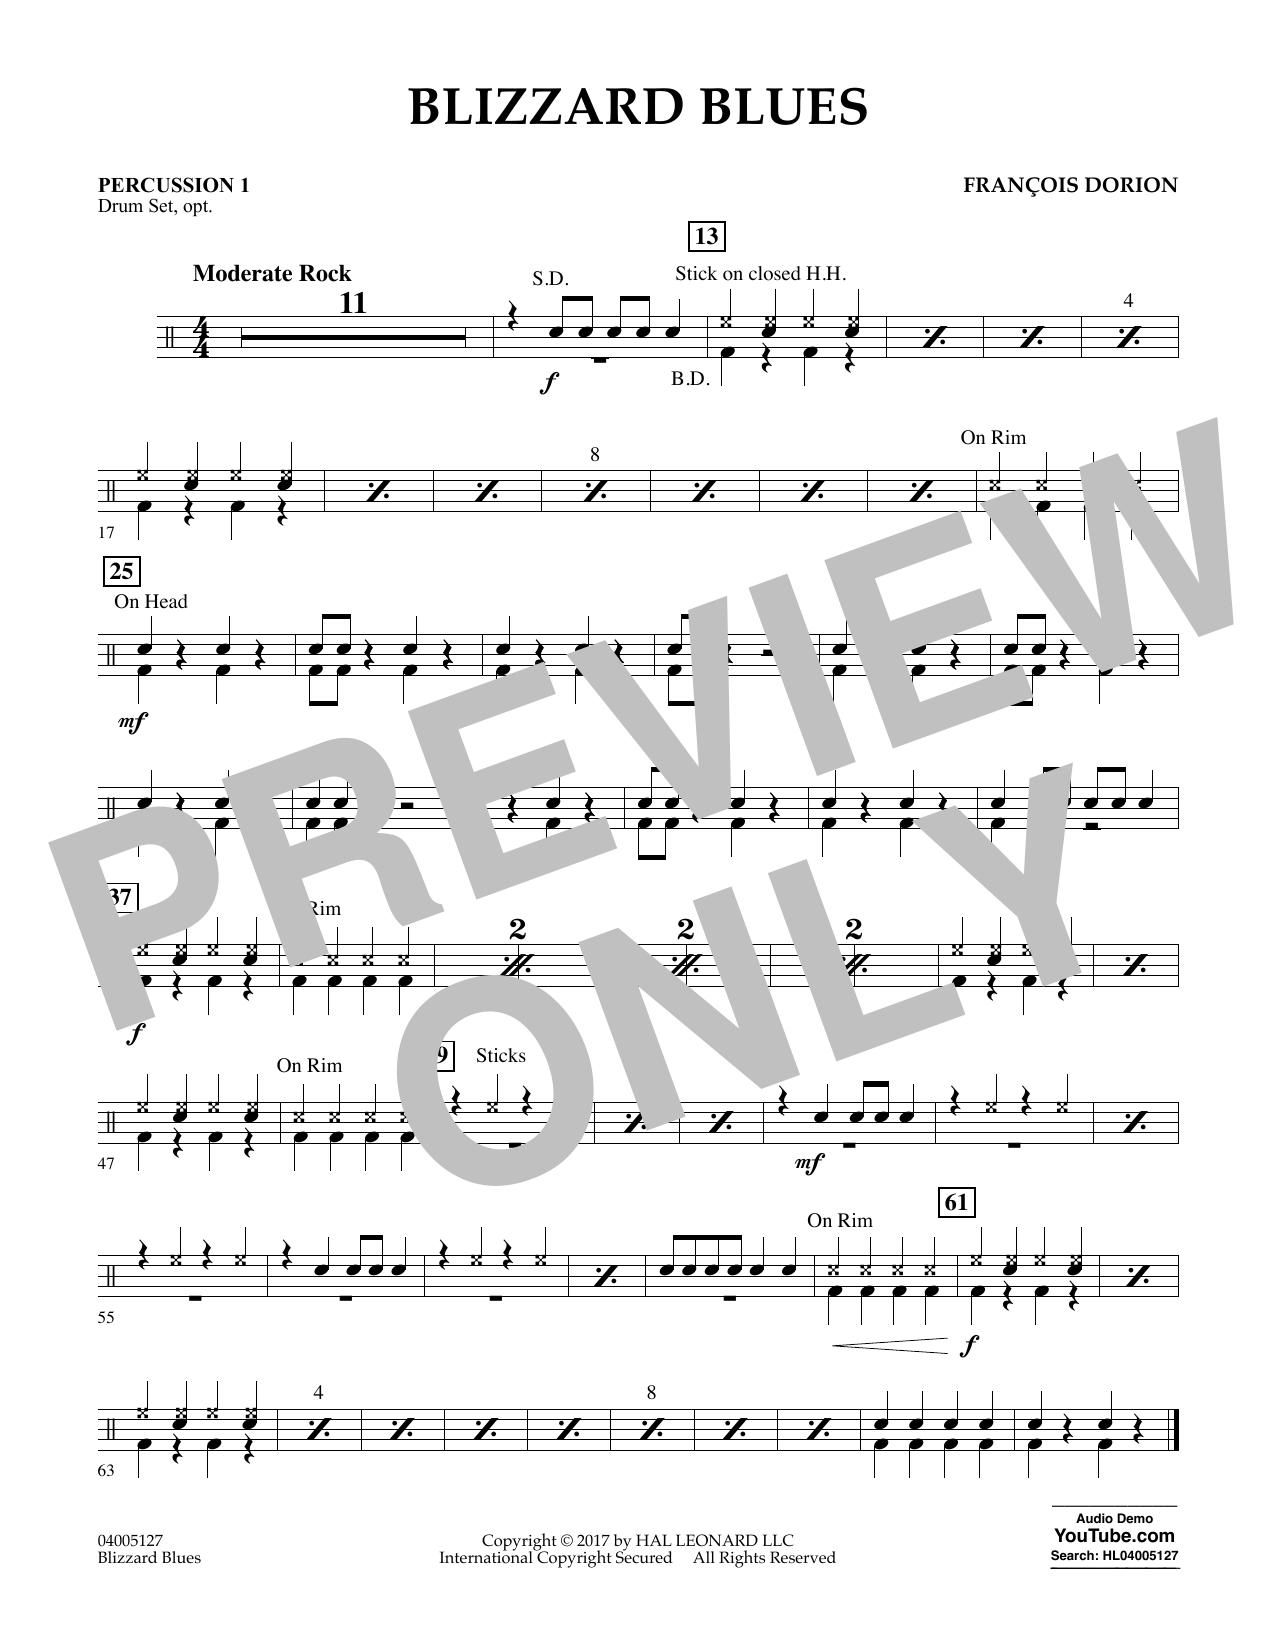 Blizzard Blues - Percussion 1 Sheet Music